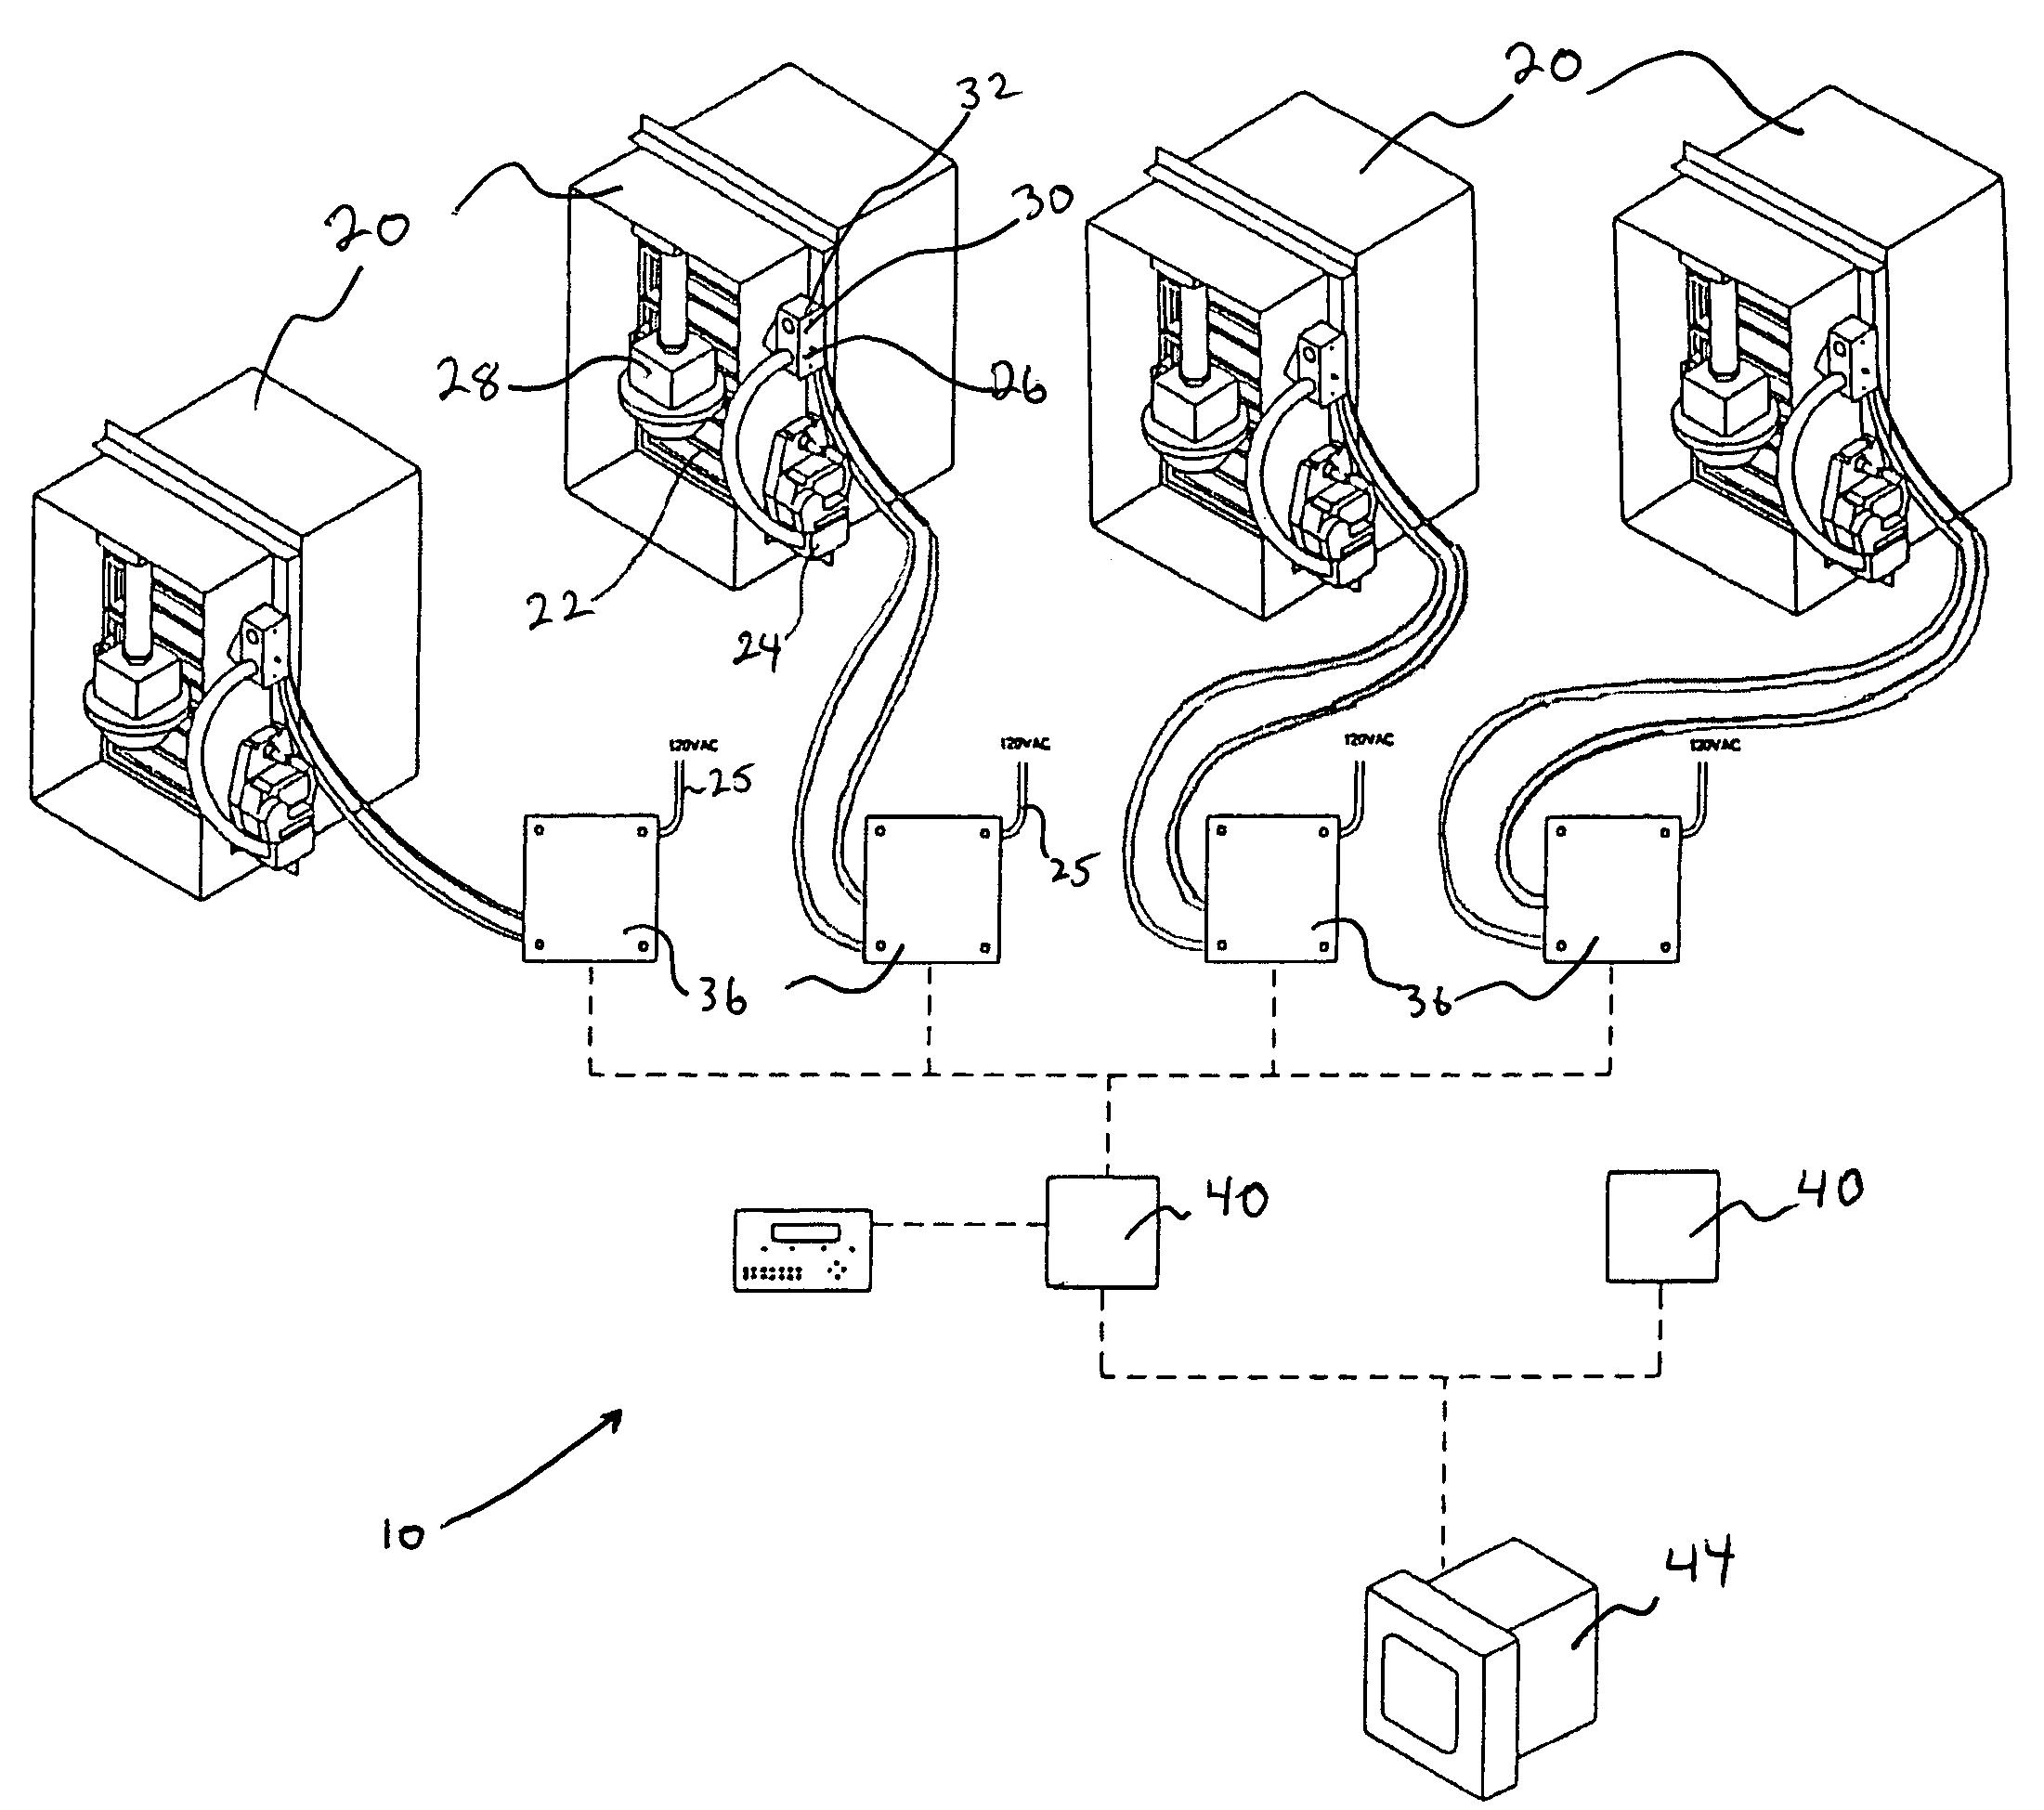 fire alarm wiring diagram damper